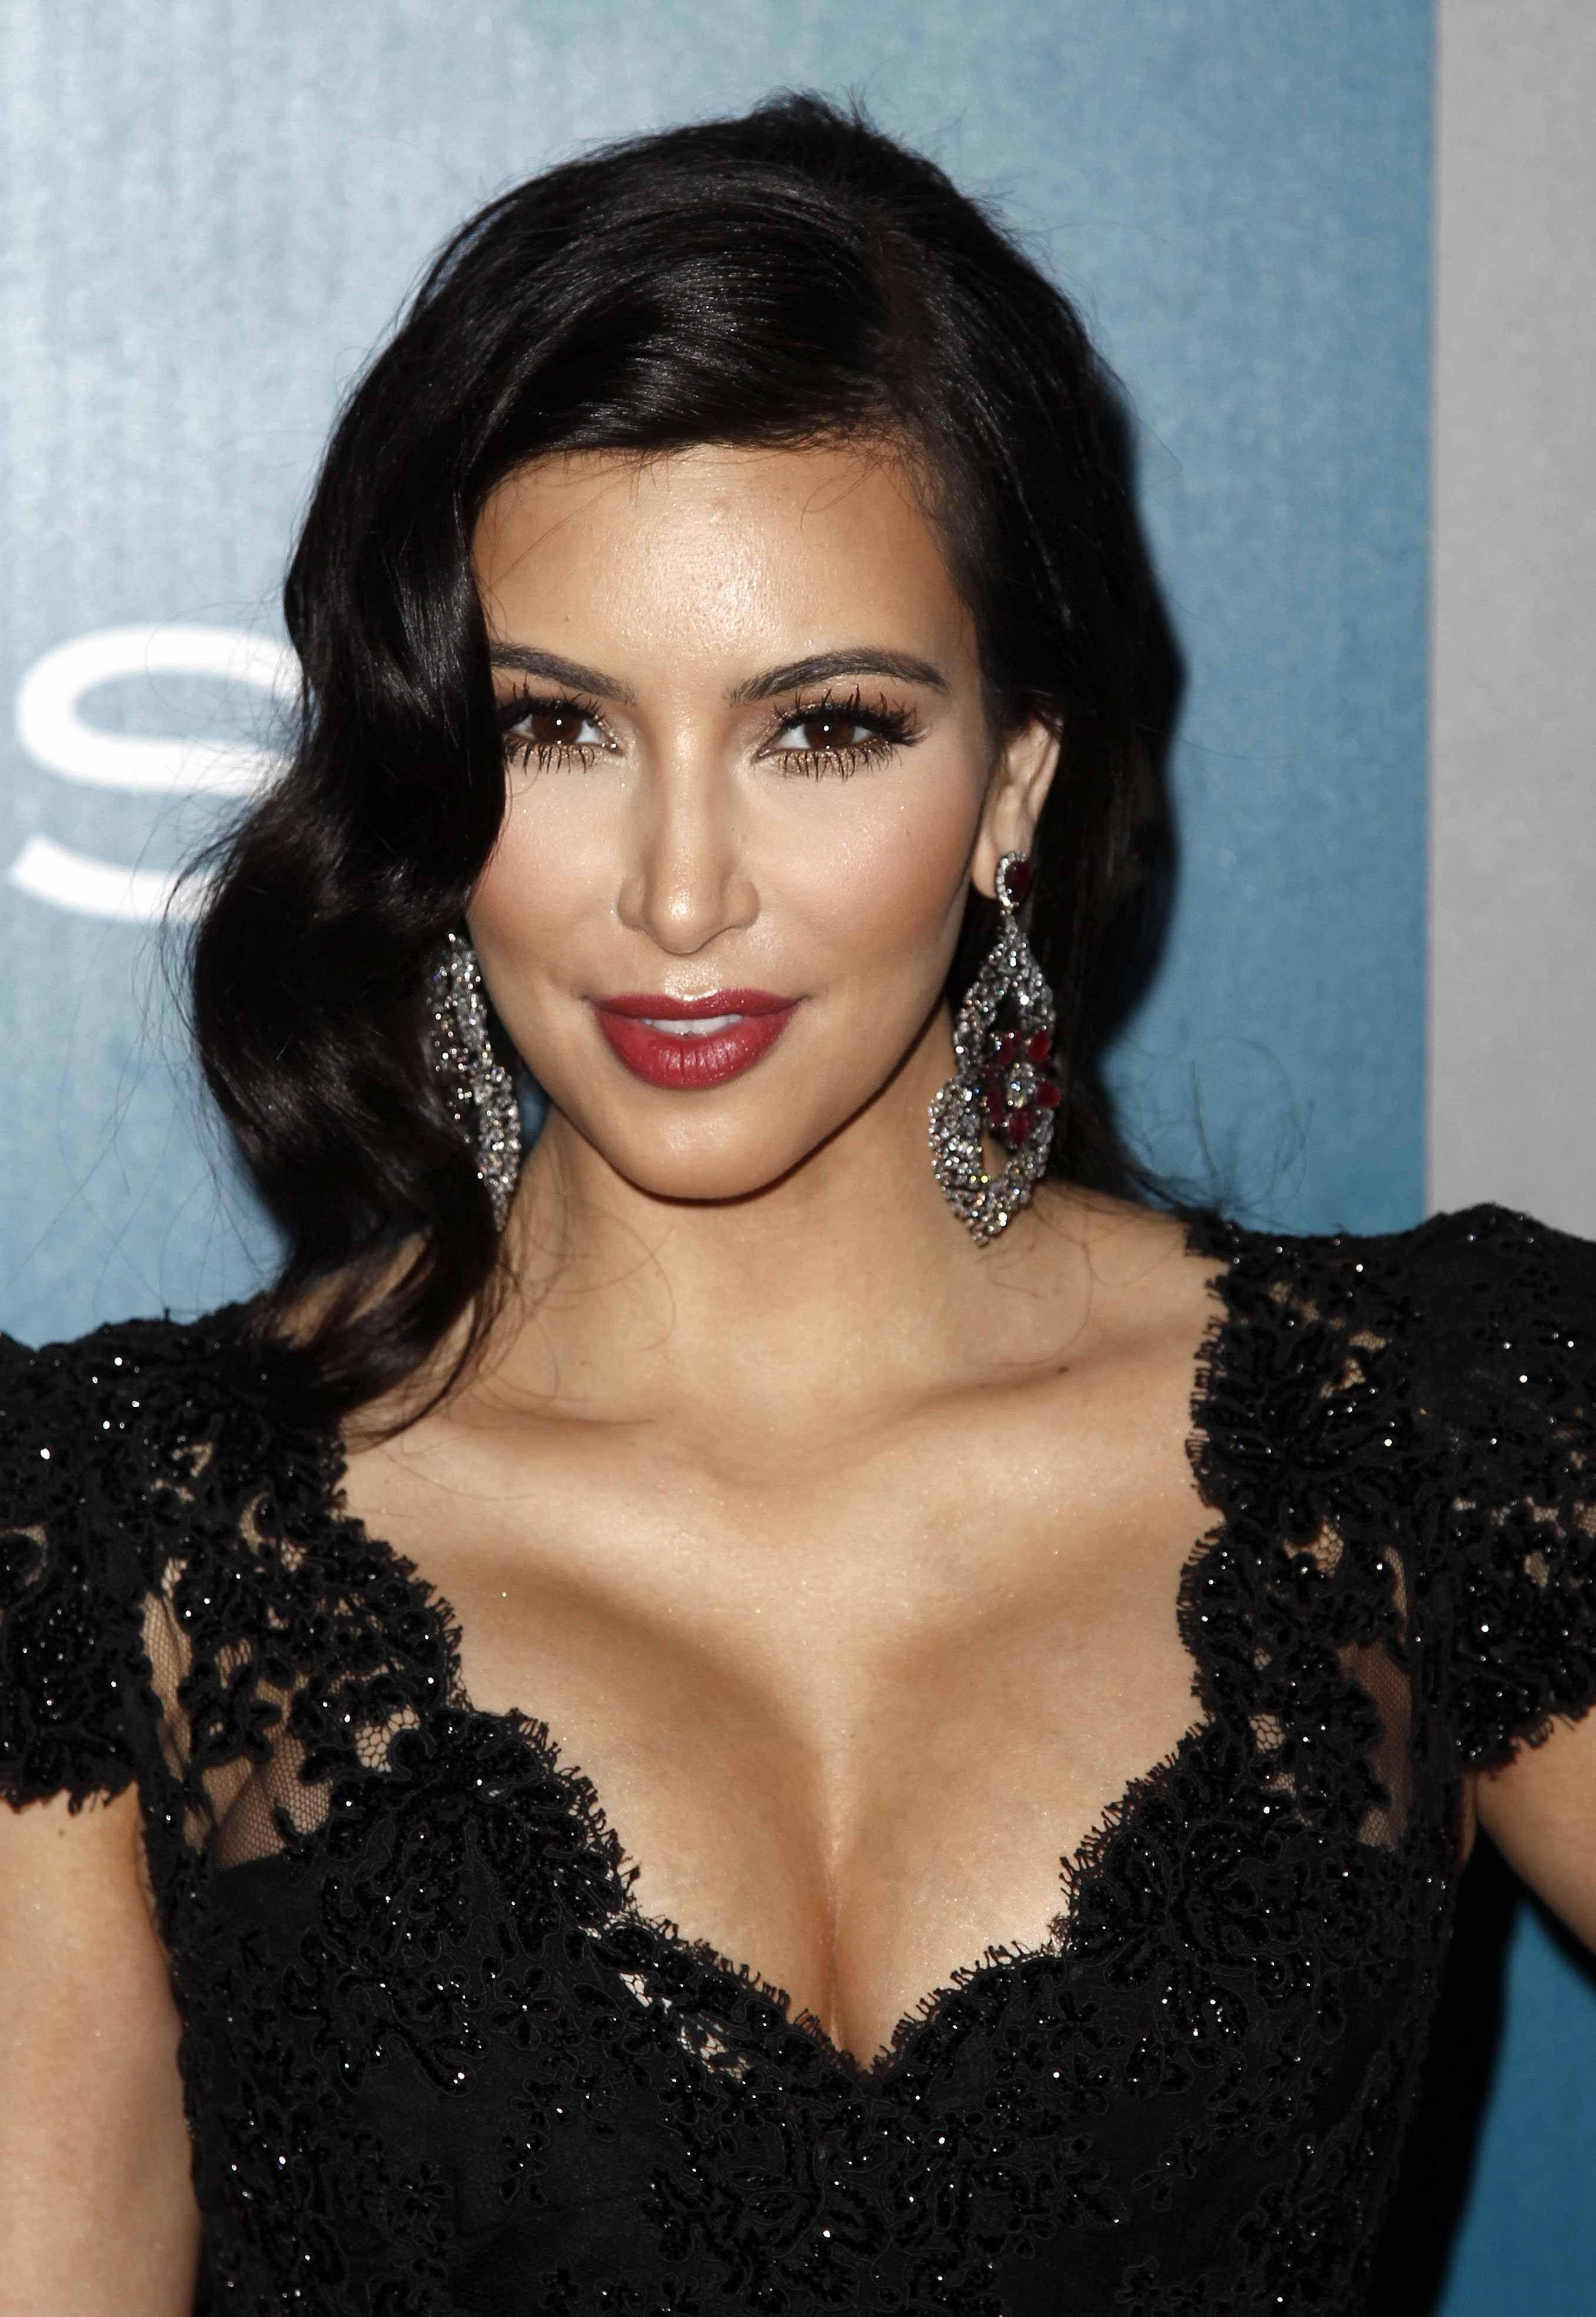 Dress black kim kardashian - Kim Kardashian Golden Globe Awards Wb Instyle After Party Jpg 2712 X